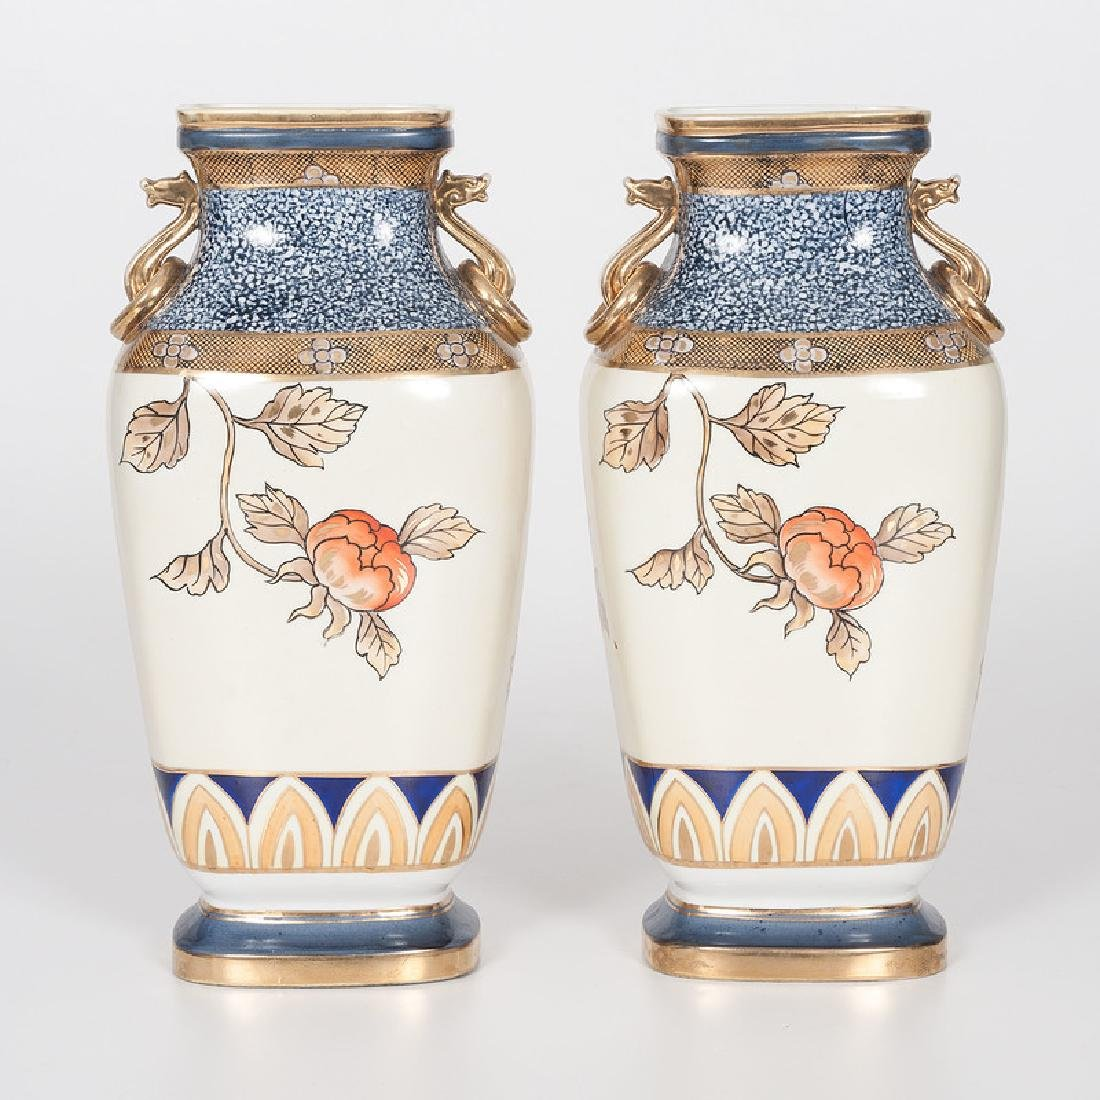 Noritake Hand-Painted Vases - 3